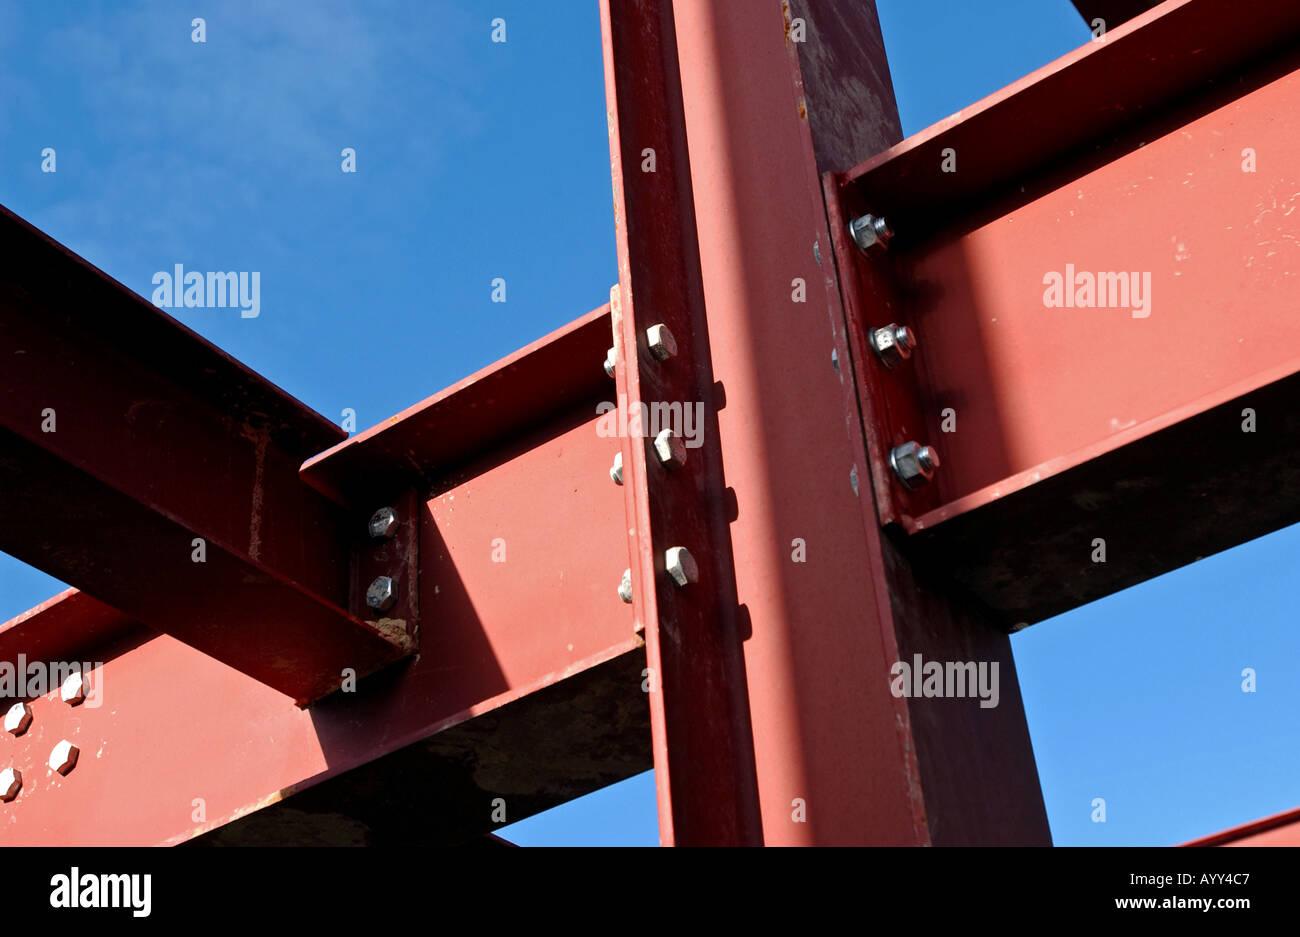 Close up of iron girders - Stock Image